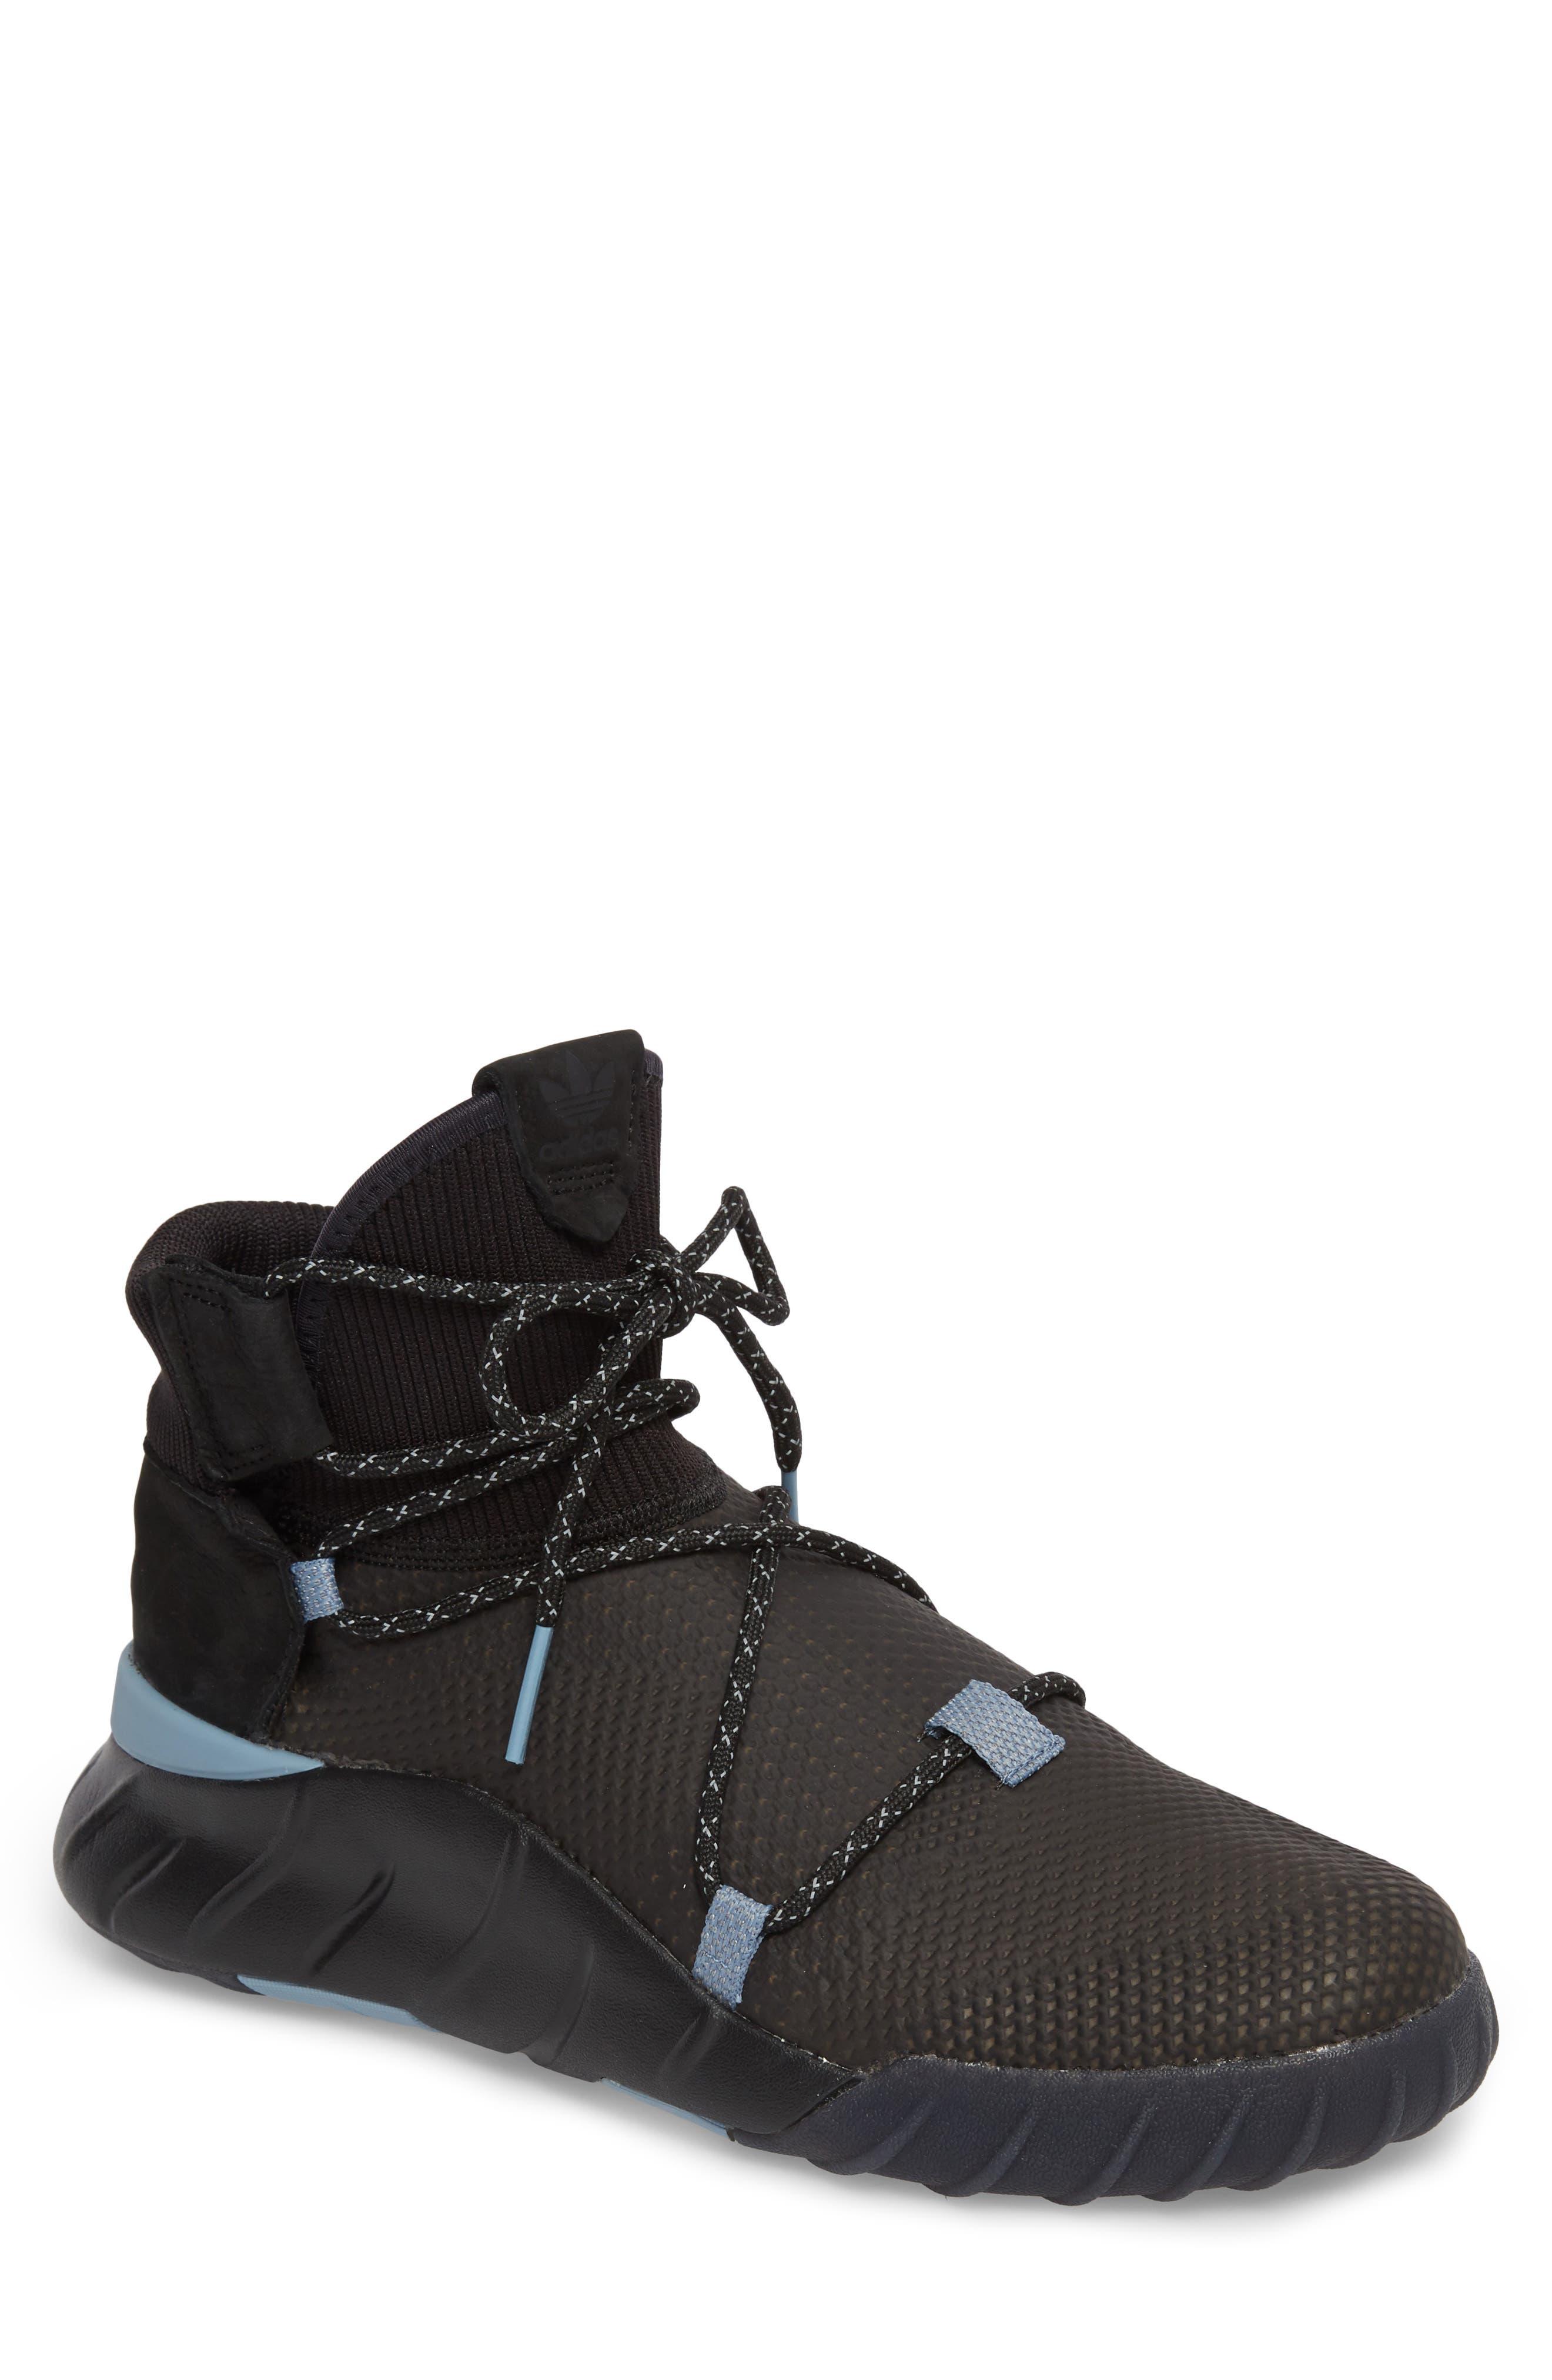 adidas Tubular X 2.0 PK Sneaker (Men)